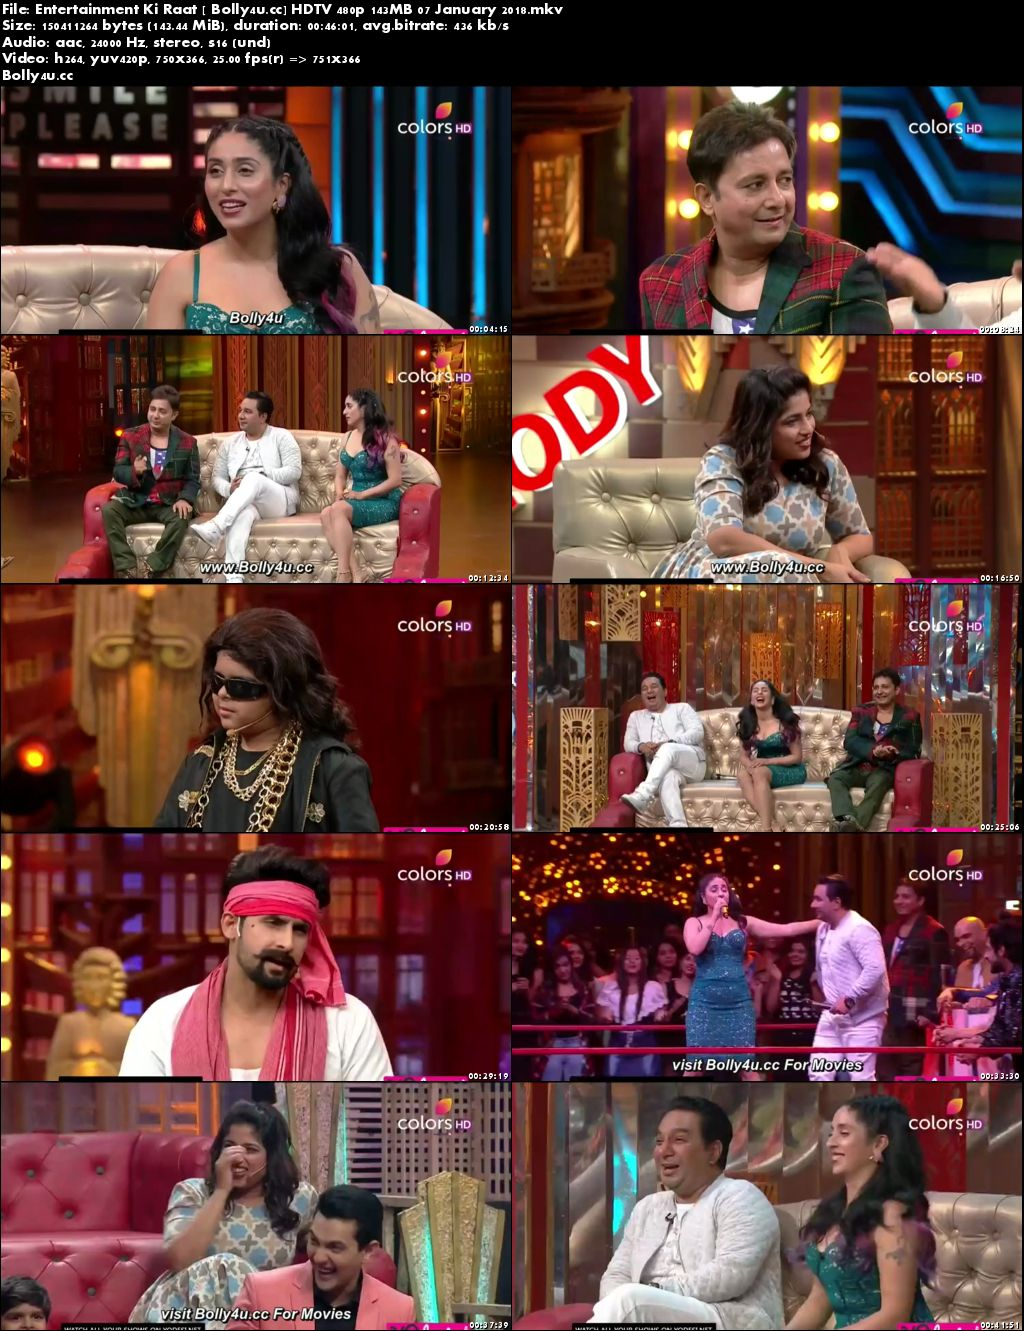 Entertainment Ki Raat HDTV 480p 140MB 07 January 2018 Download